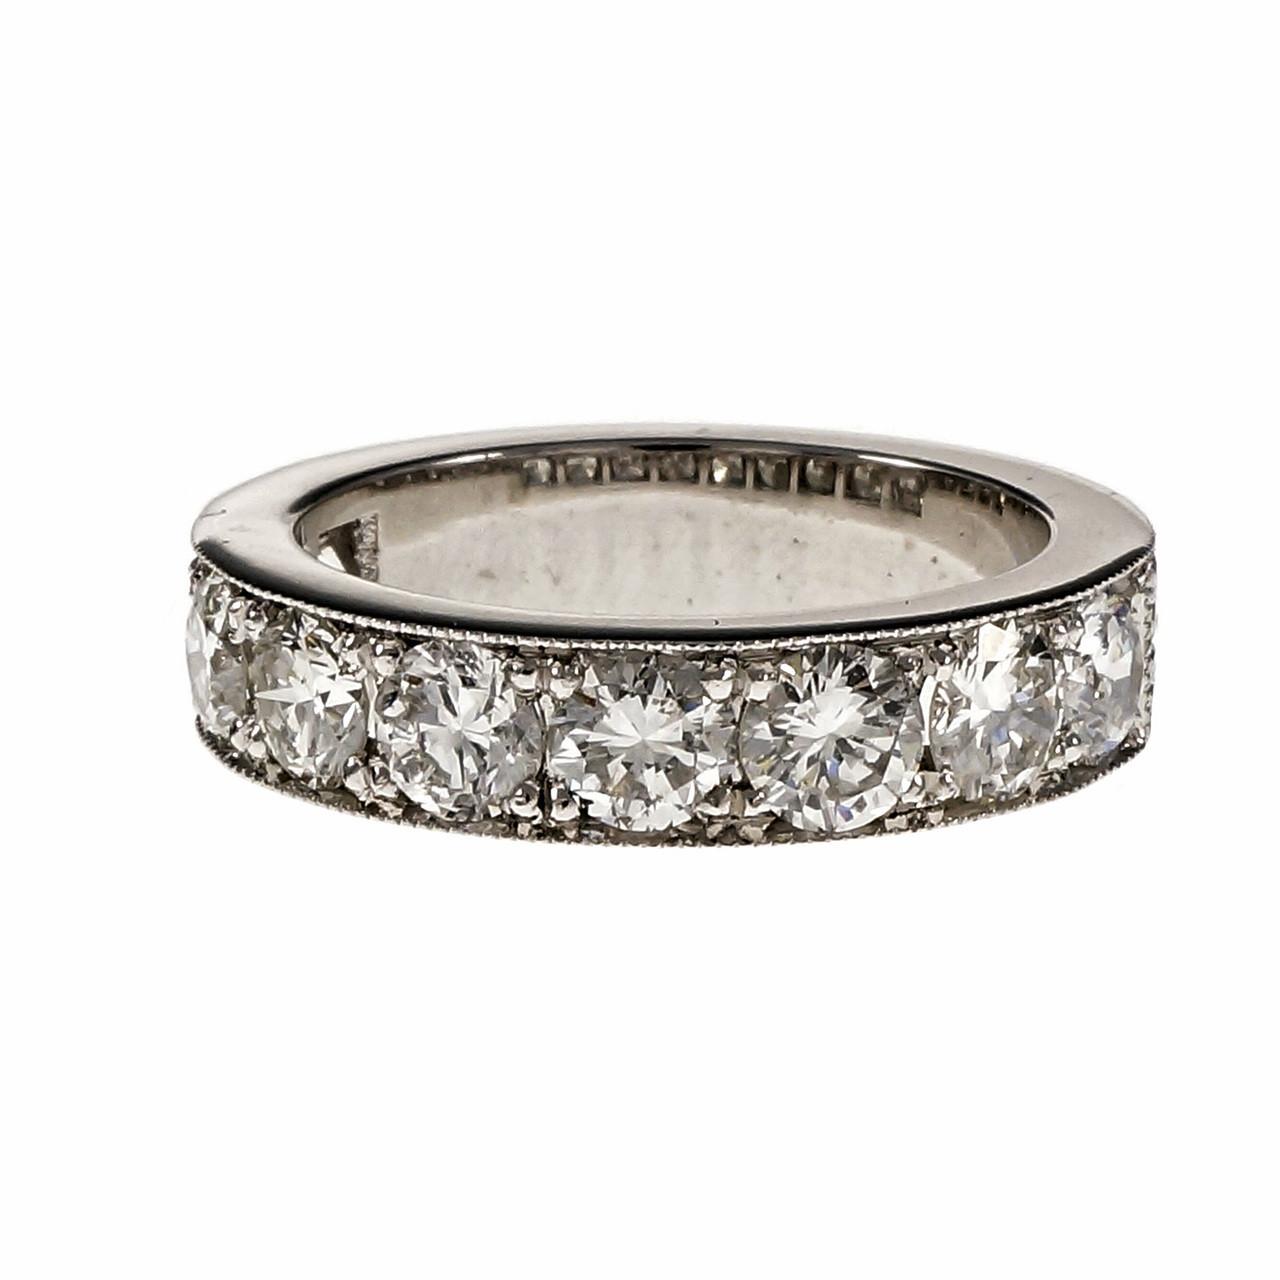 Peter Suchy Vintage Inspired Diamond Wedding Band Ring Platinum